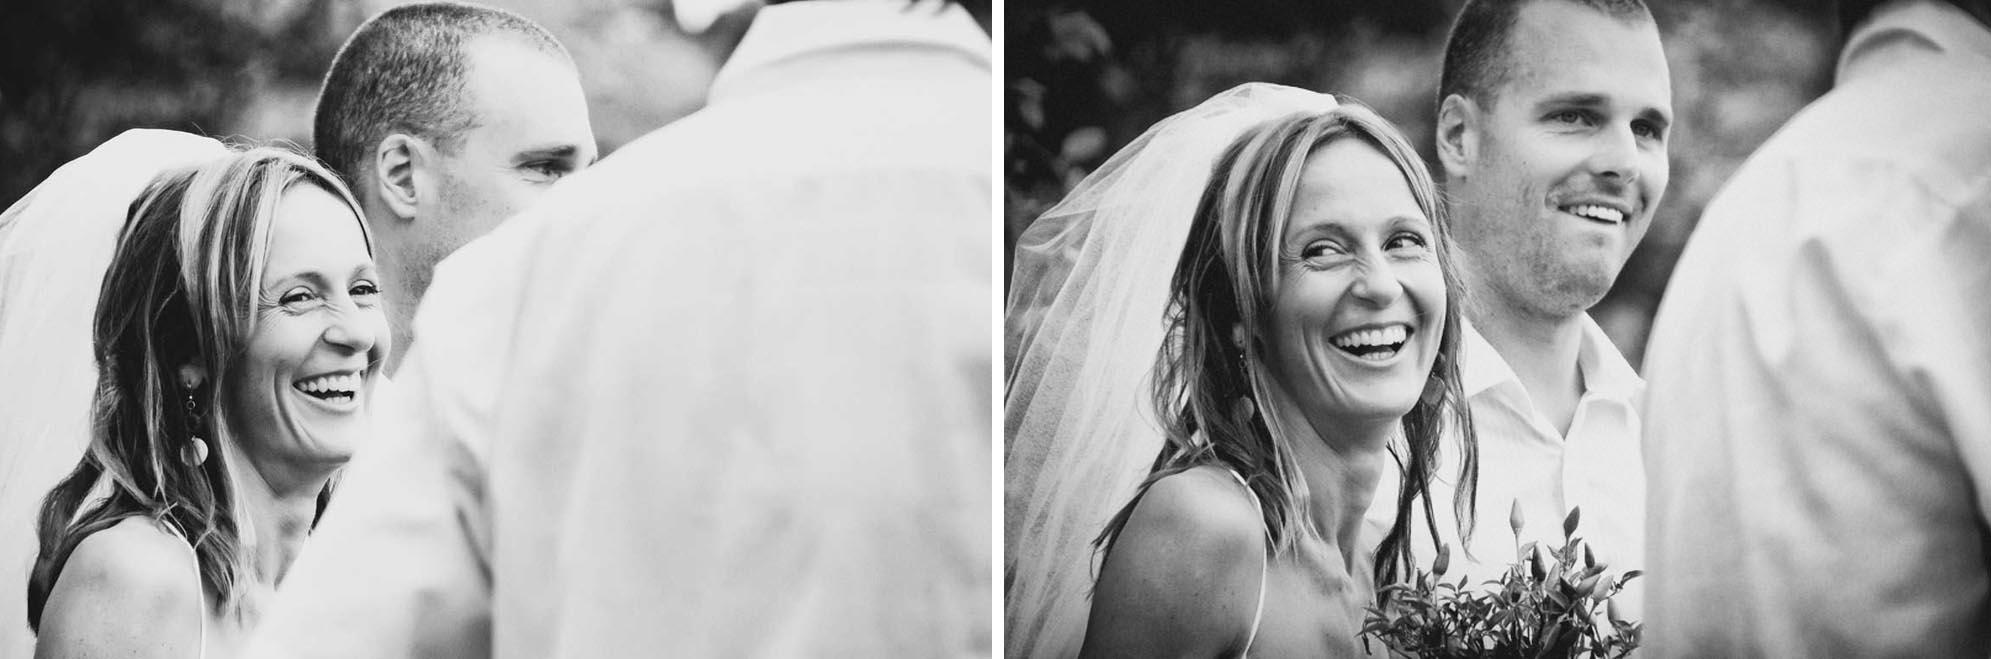 Wedding Photography_3.jpg